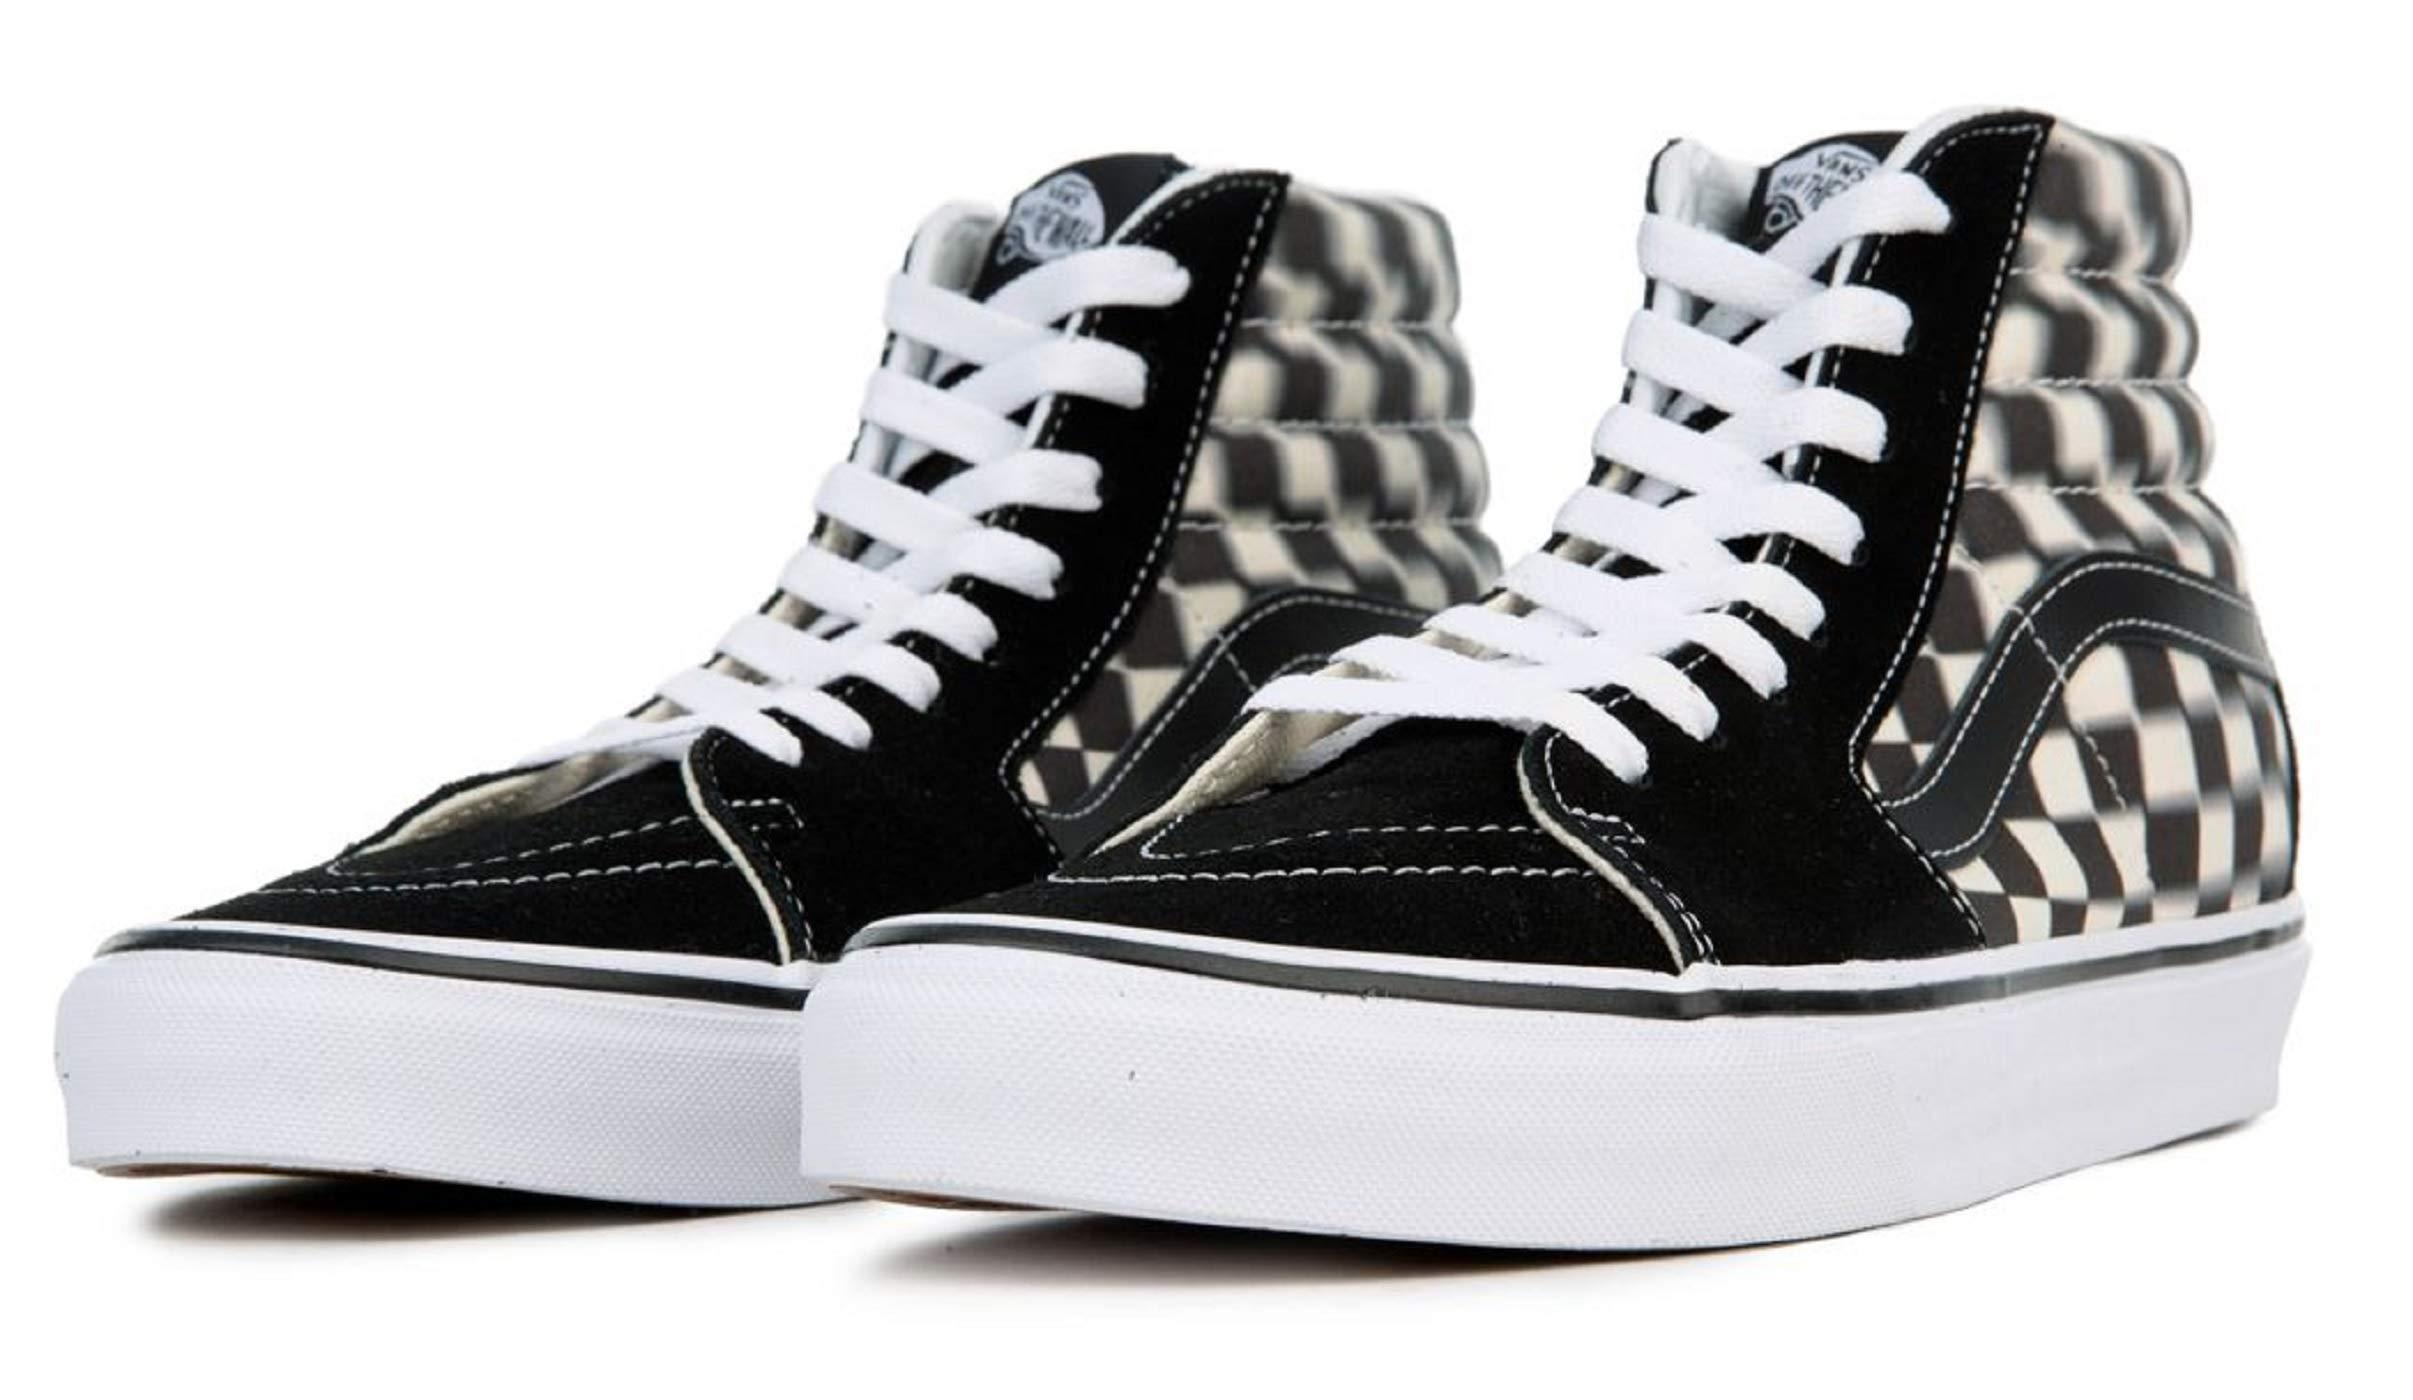 a54a5c19bd6924 Vans SK8-HI Blur Check Mens Fashion-Sneakers VN0A38GEVJM 12 - Black Classic  White